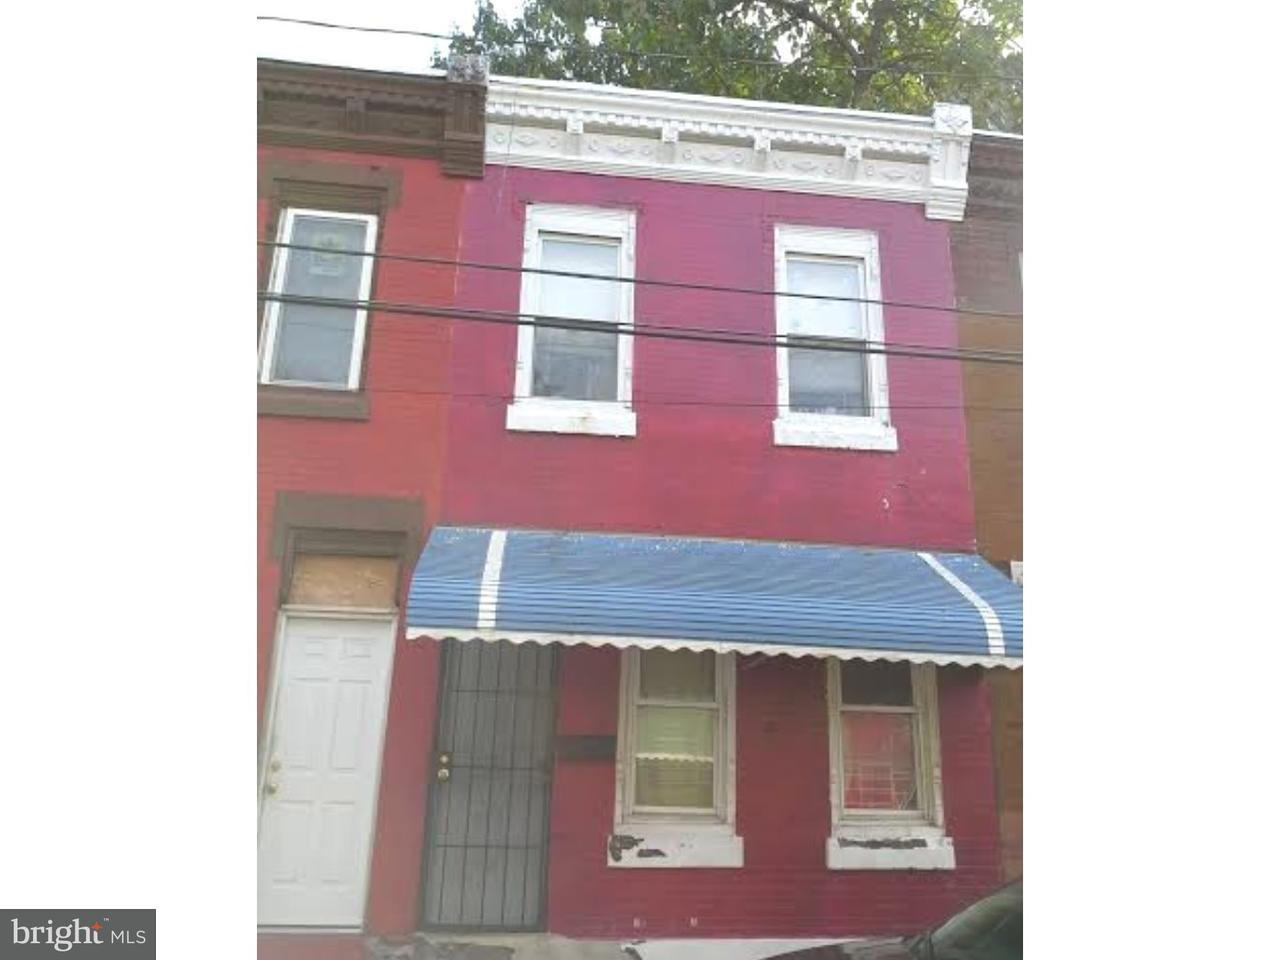 3113 N Carlisle Philadelphia, PA 19132